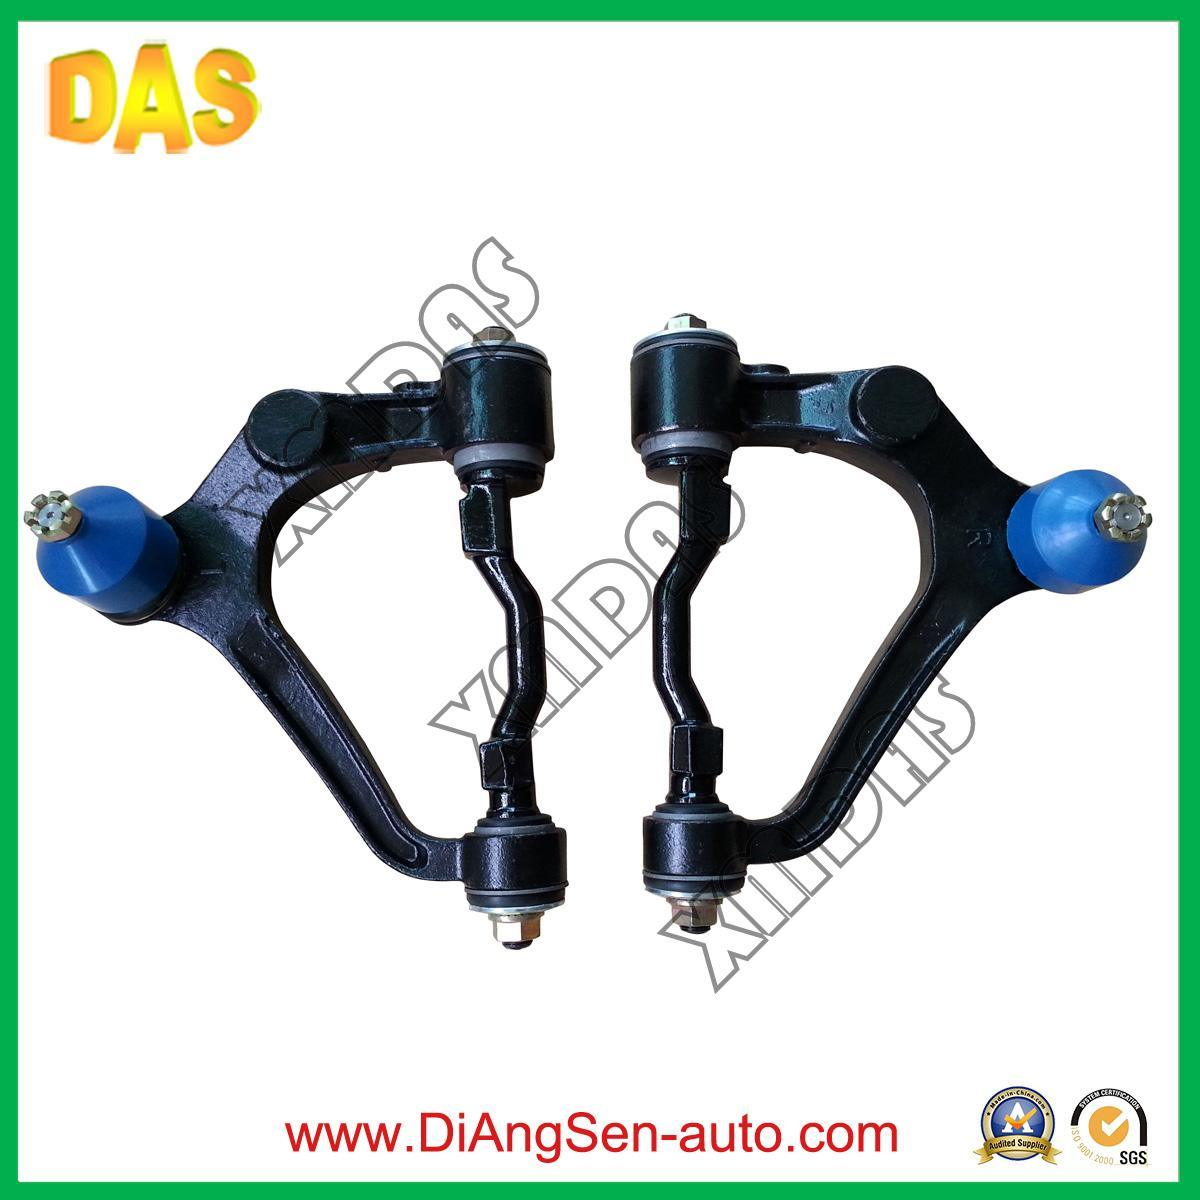 Auto Suspension Parts - Lower Control Arm for Nissan X-Trail (54500-8h310RH/54501-8H310LH)